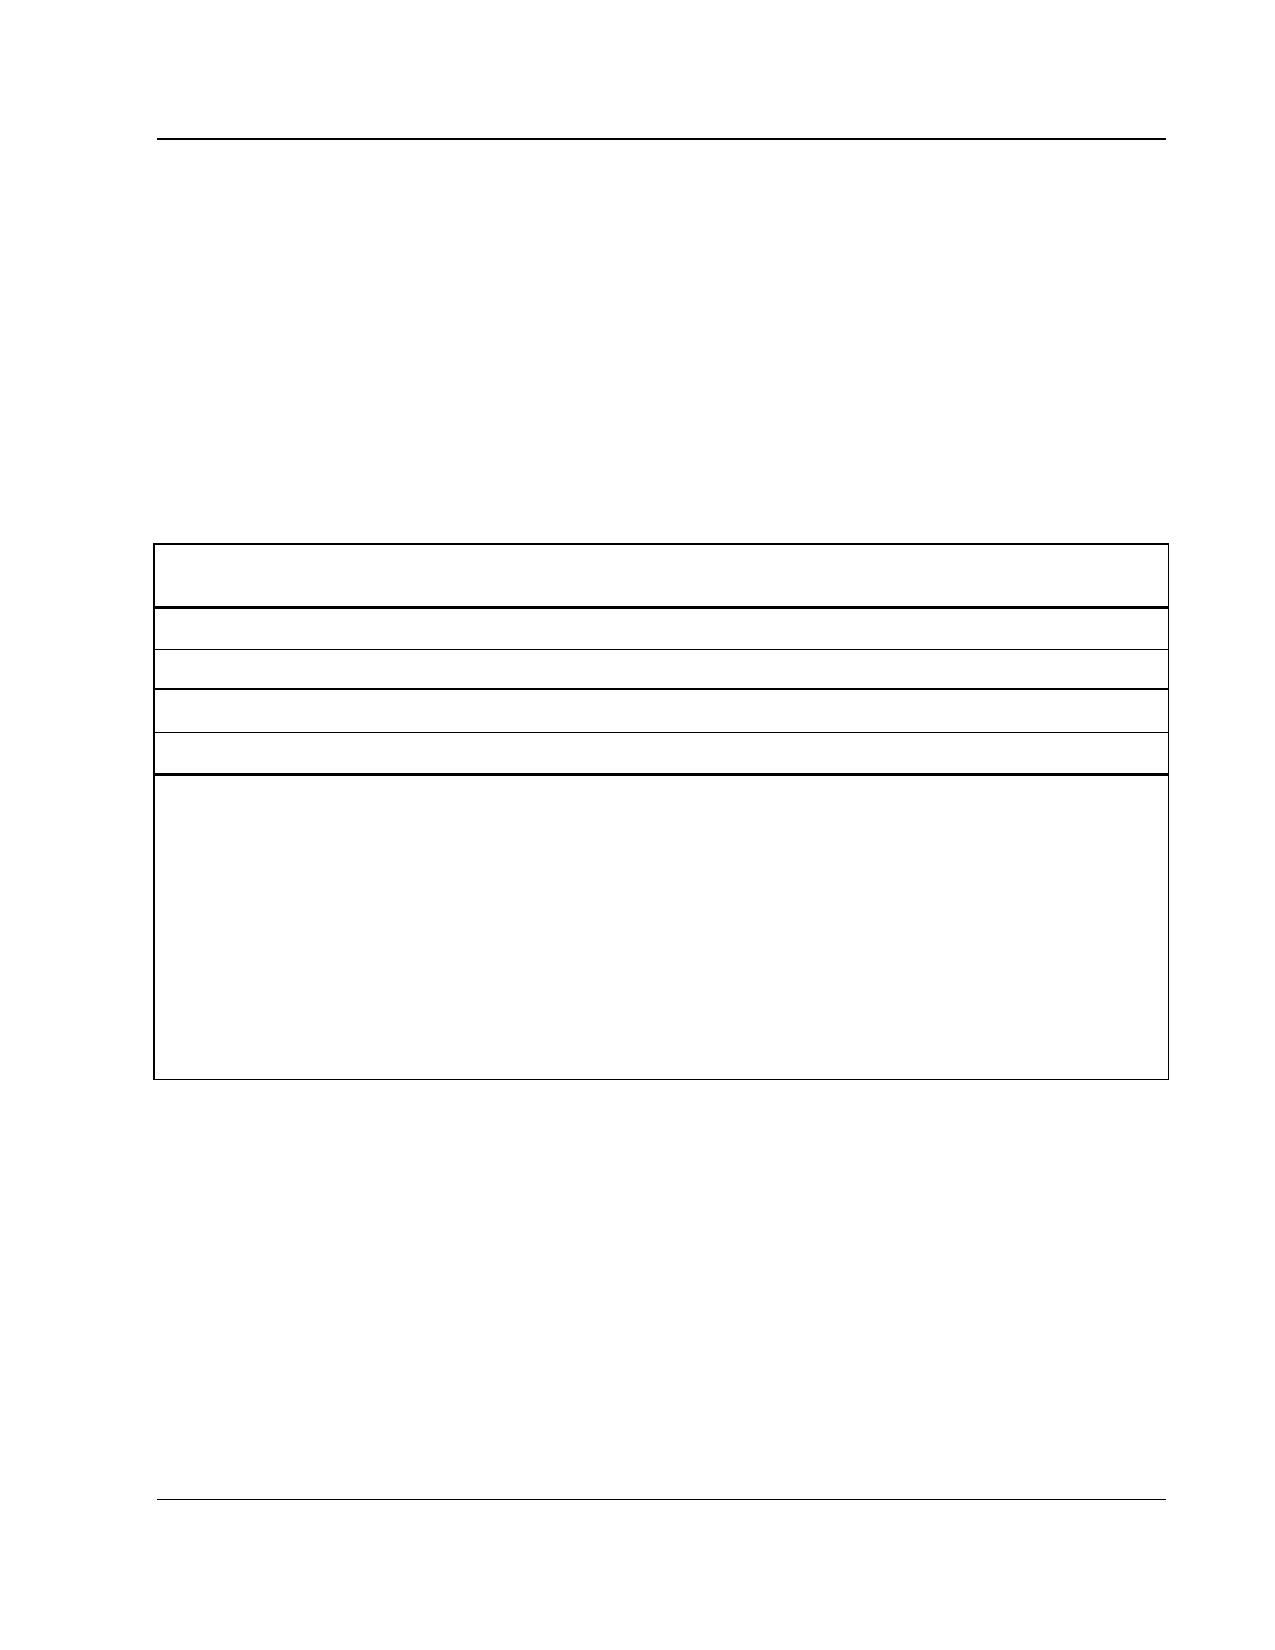 1N953 Datenblatt PDF